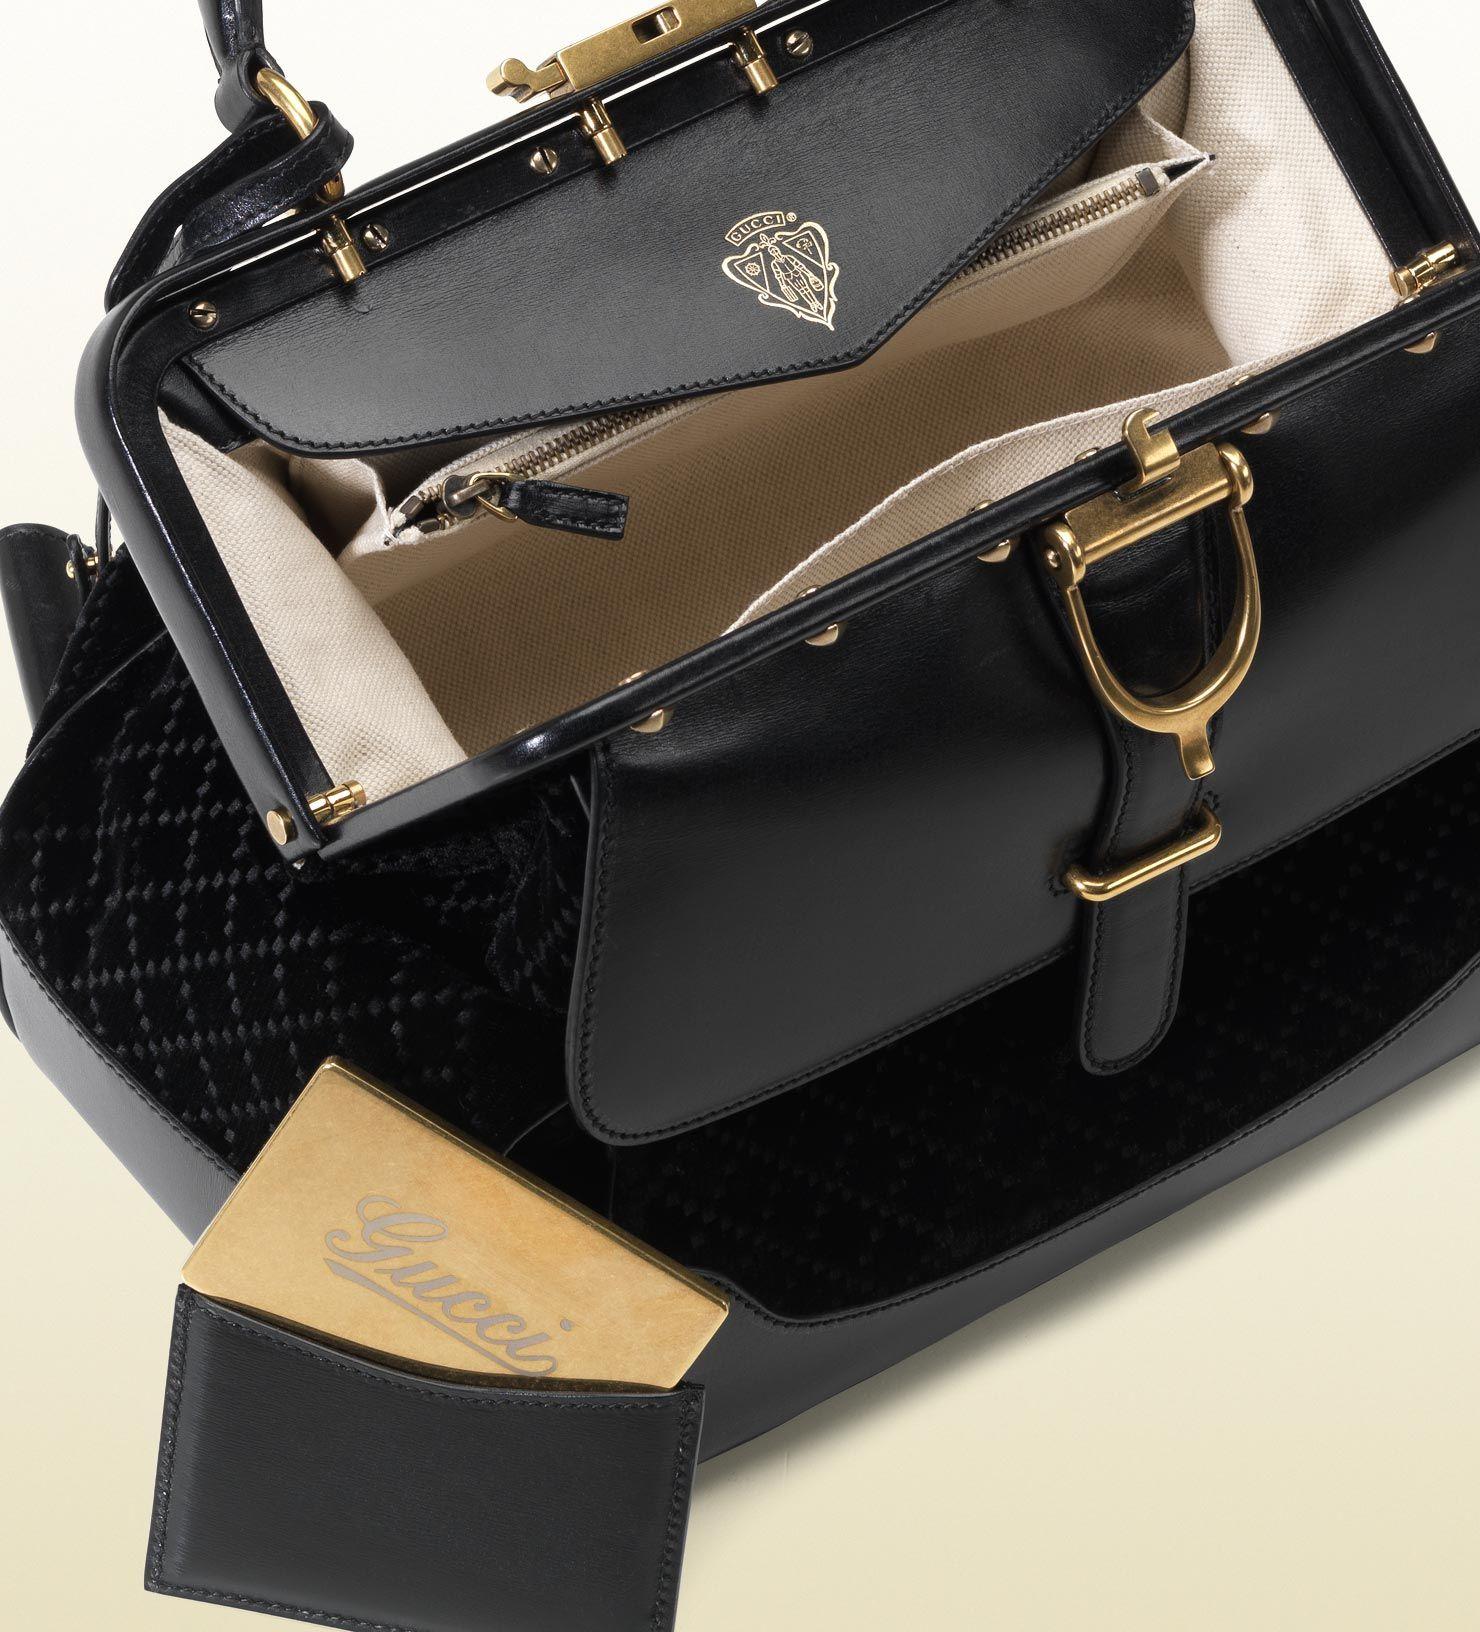 replica bottega veneta handbags wallet as seen on tv box